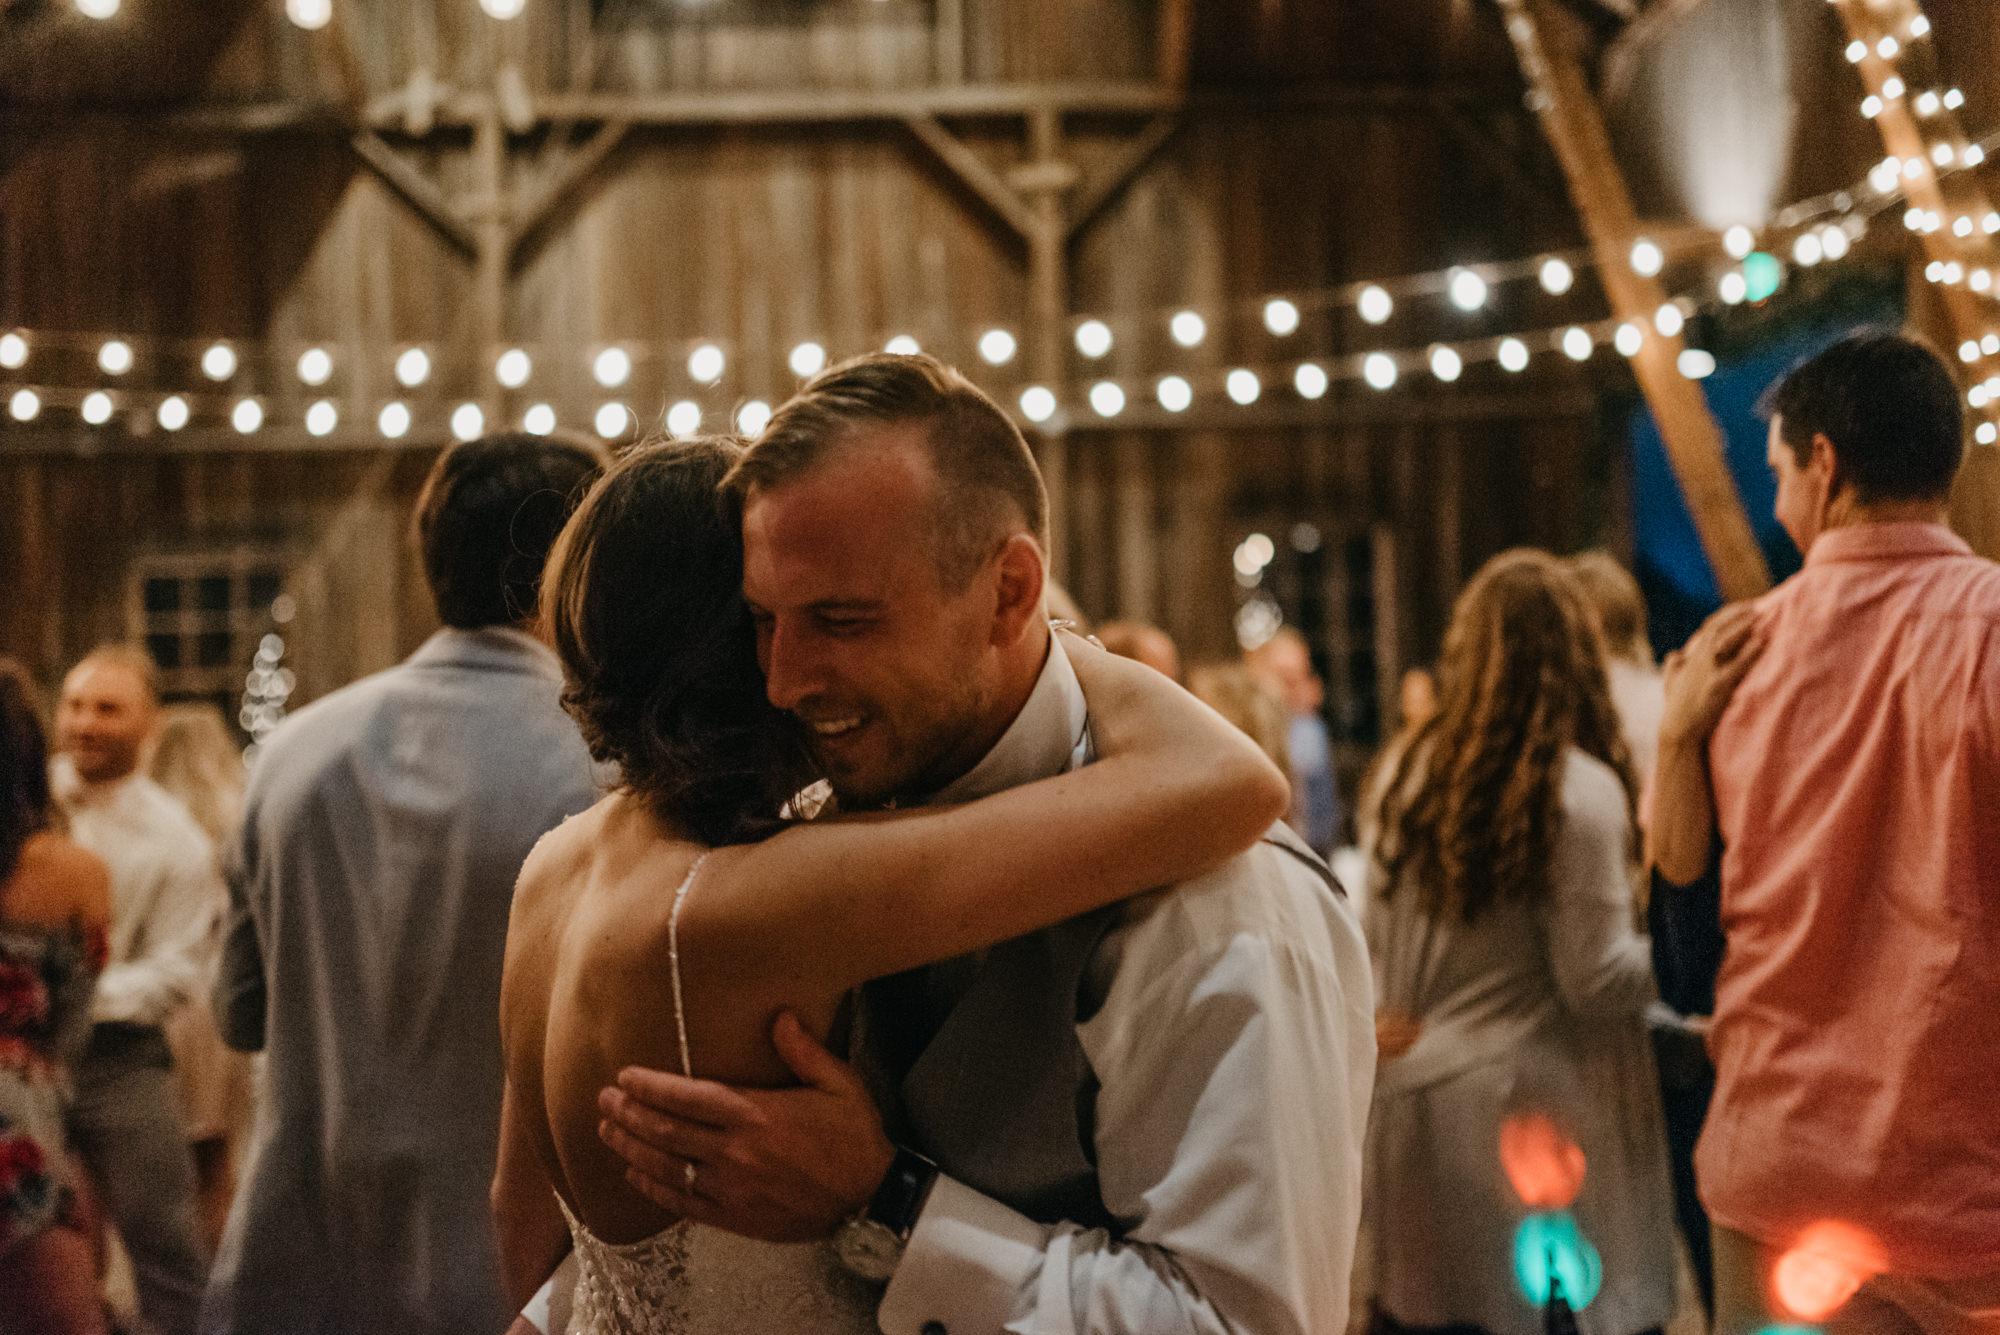 219-portland-northwest-wedding-bubble-exit-barn-string-lights.jpg